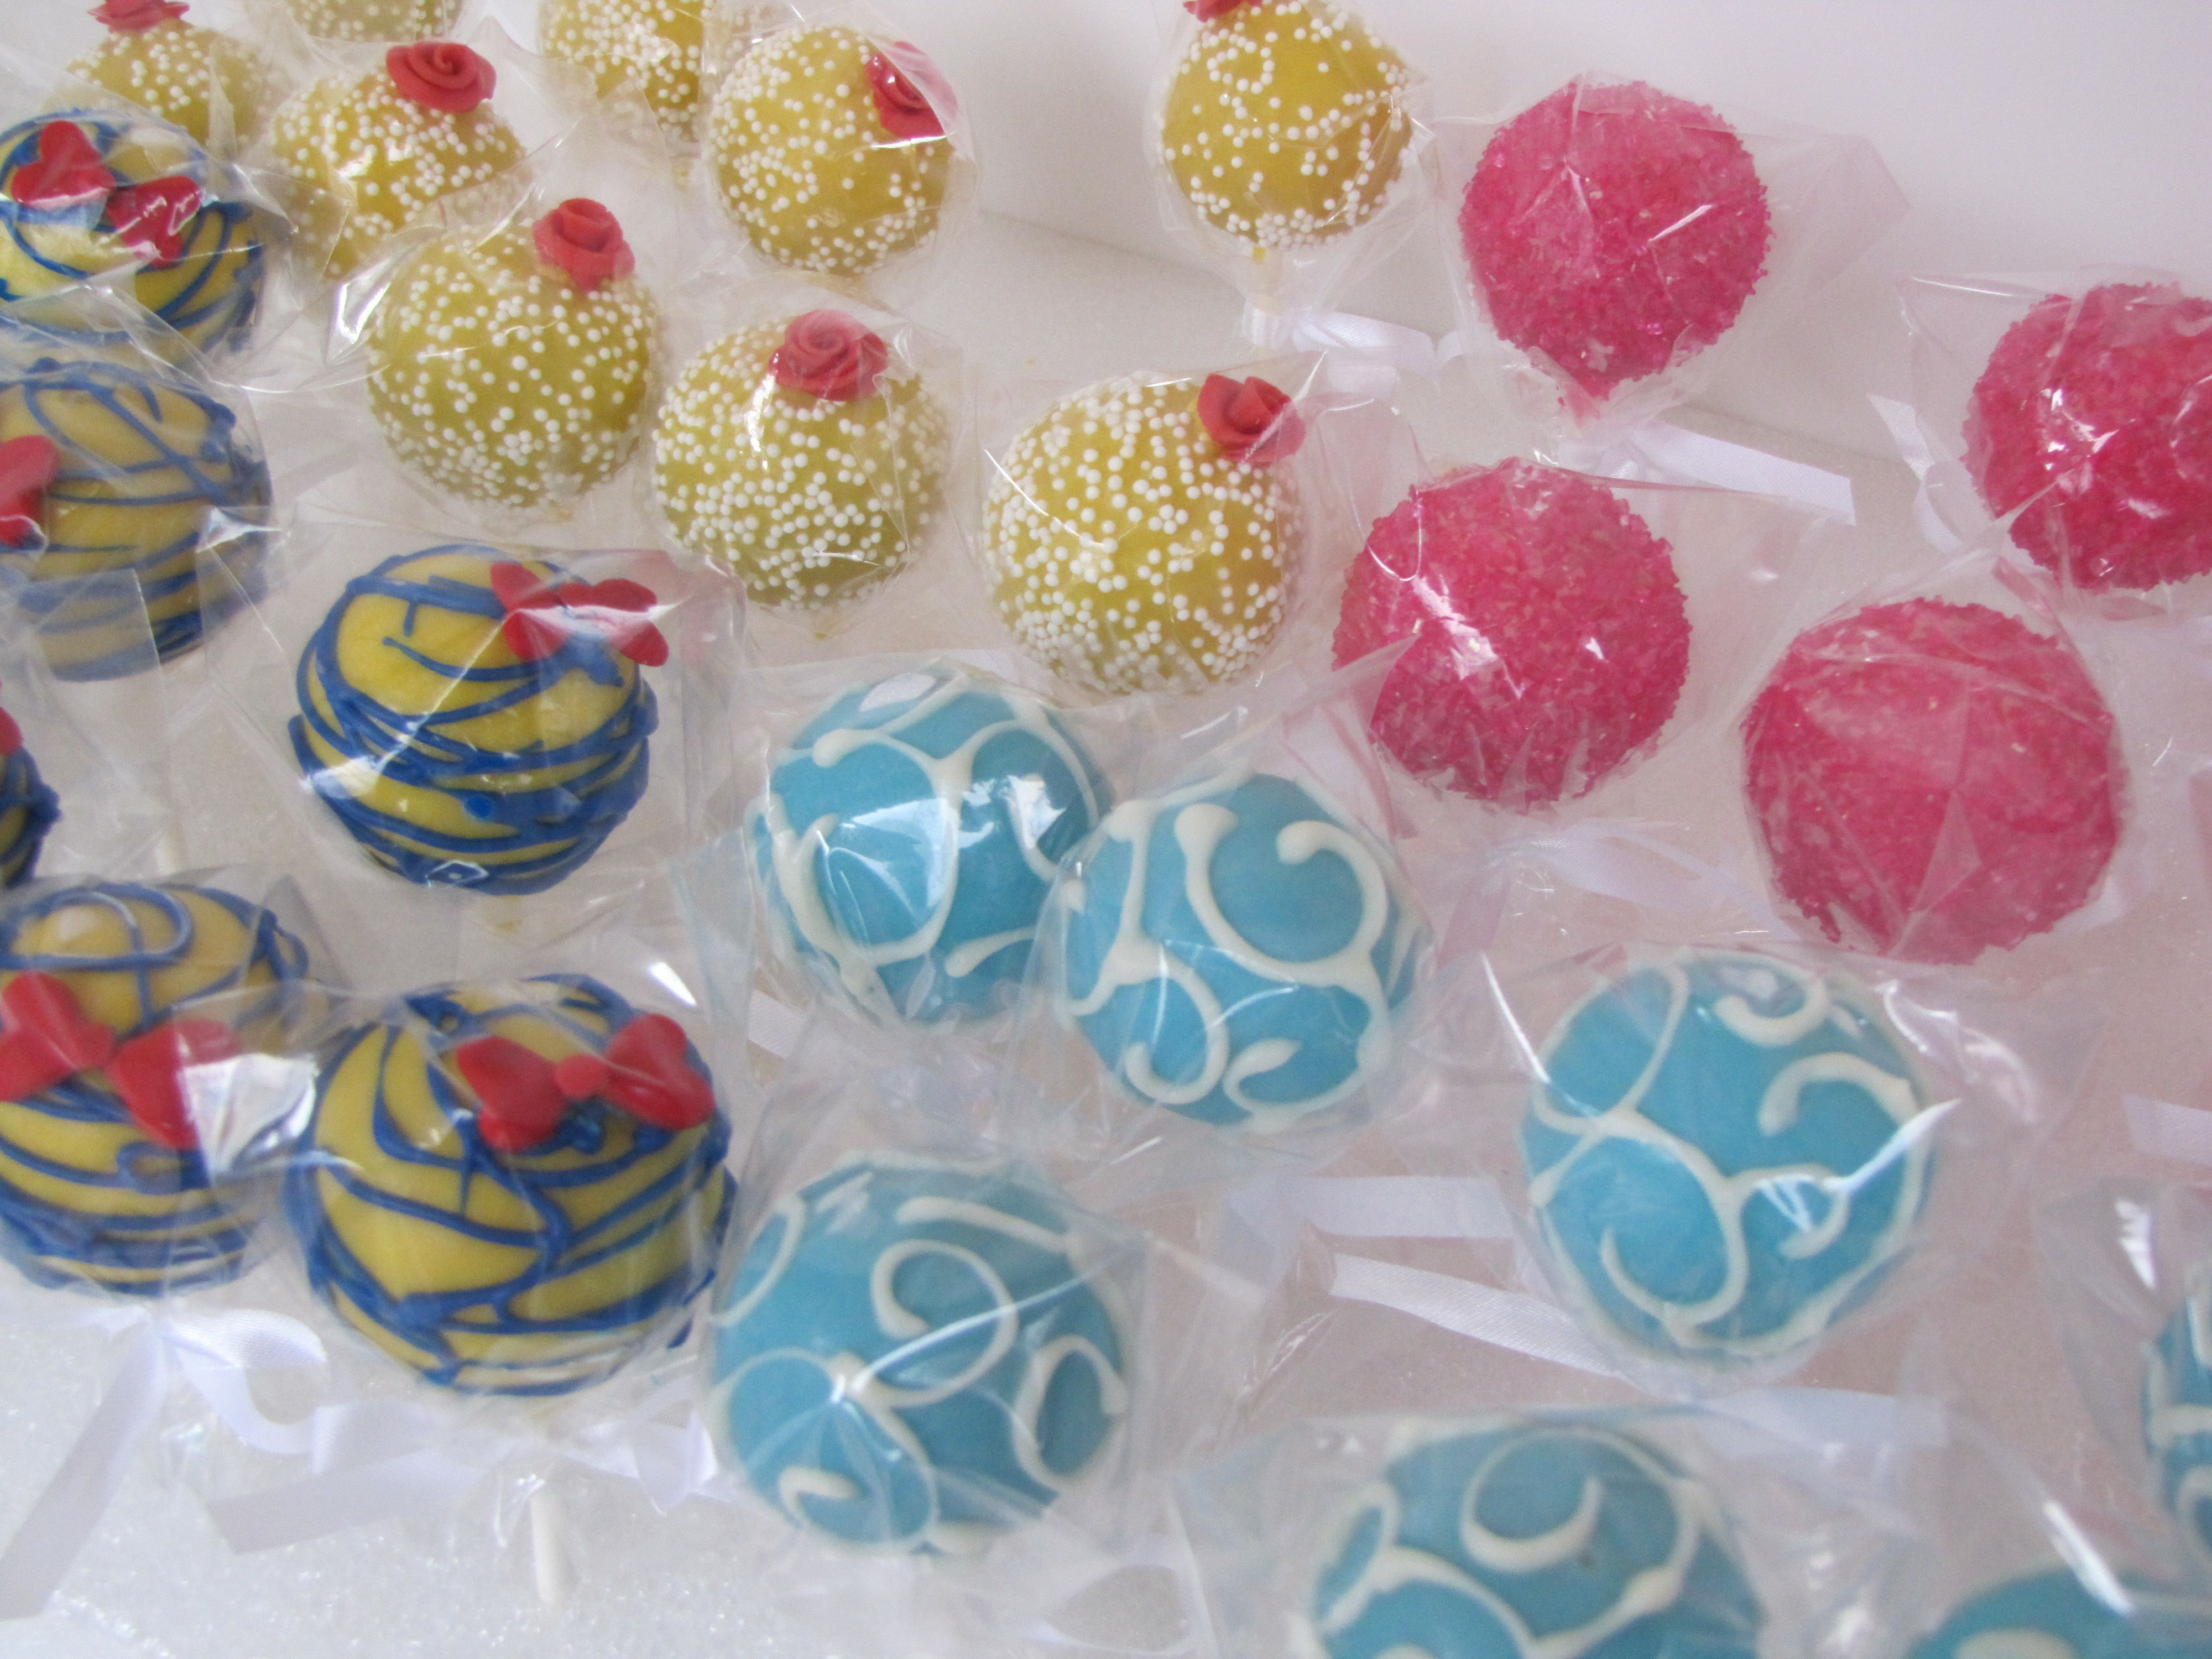 cinderella cake pops - Google Search